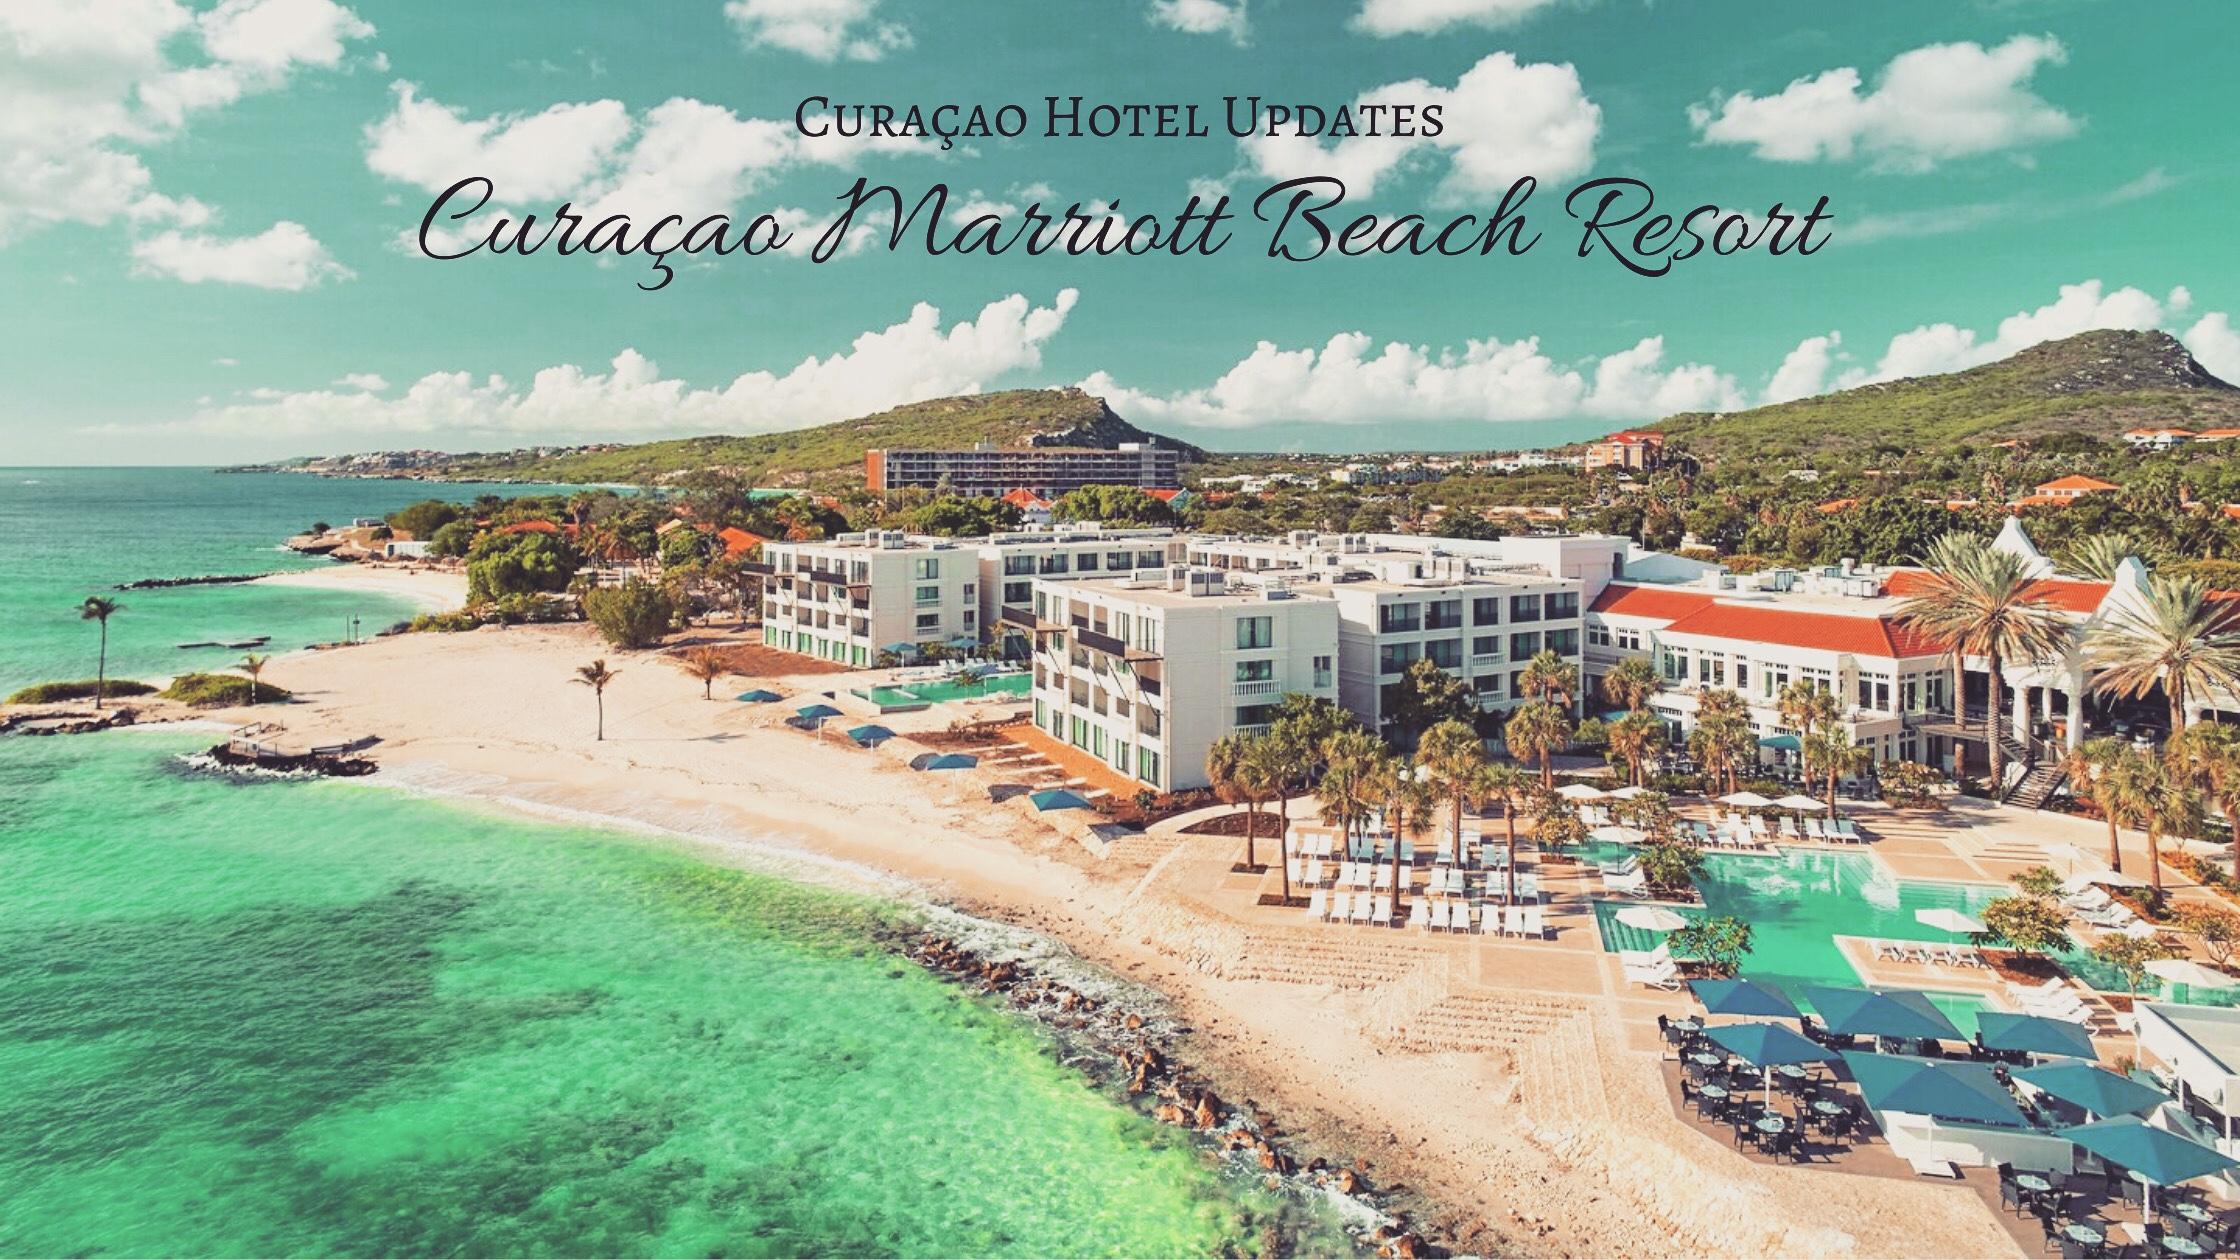 Curaçao Hotel Updates: Curaçao Marriott Beach Resort